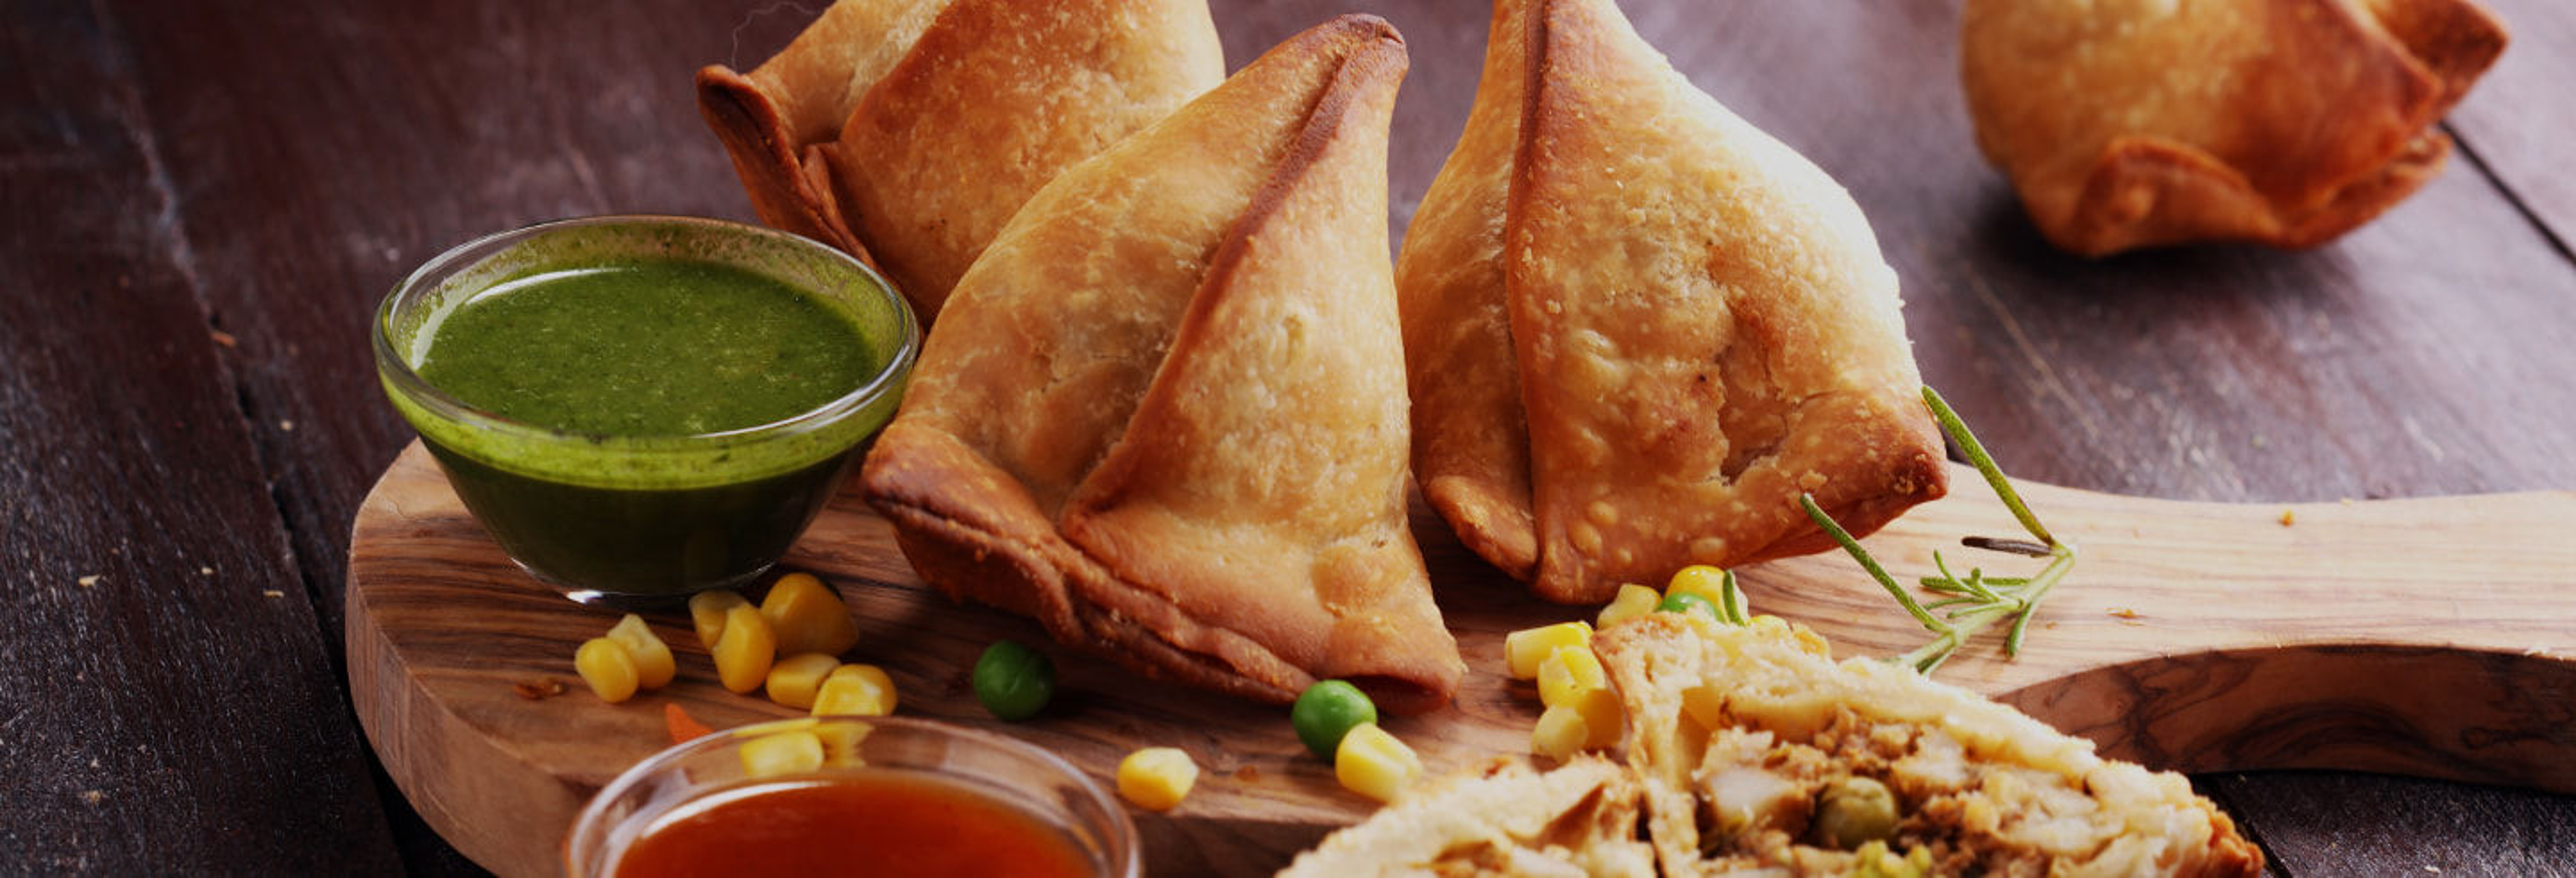 Tour gastronómico por Delhi